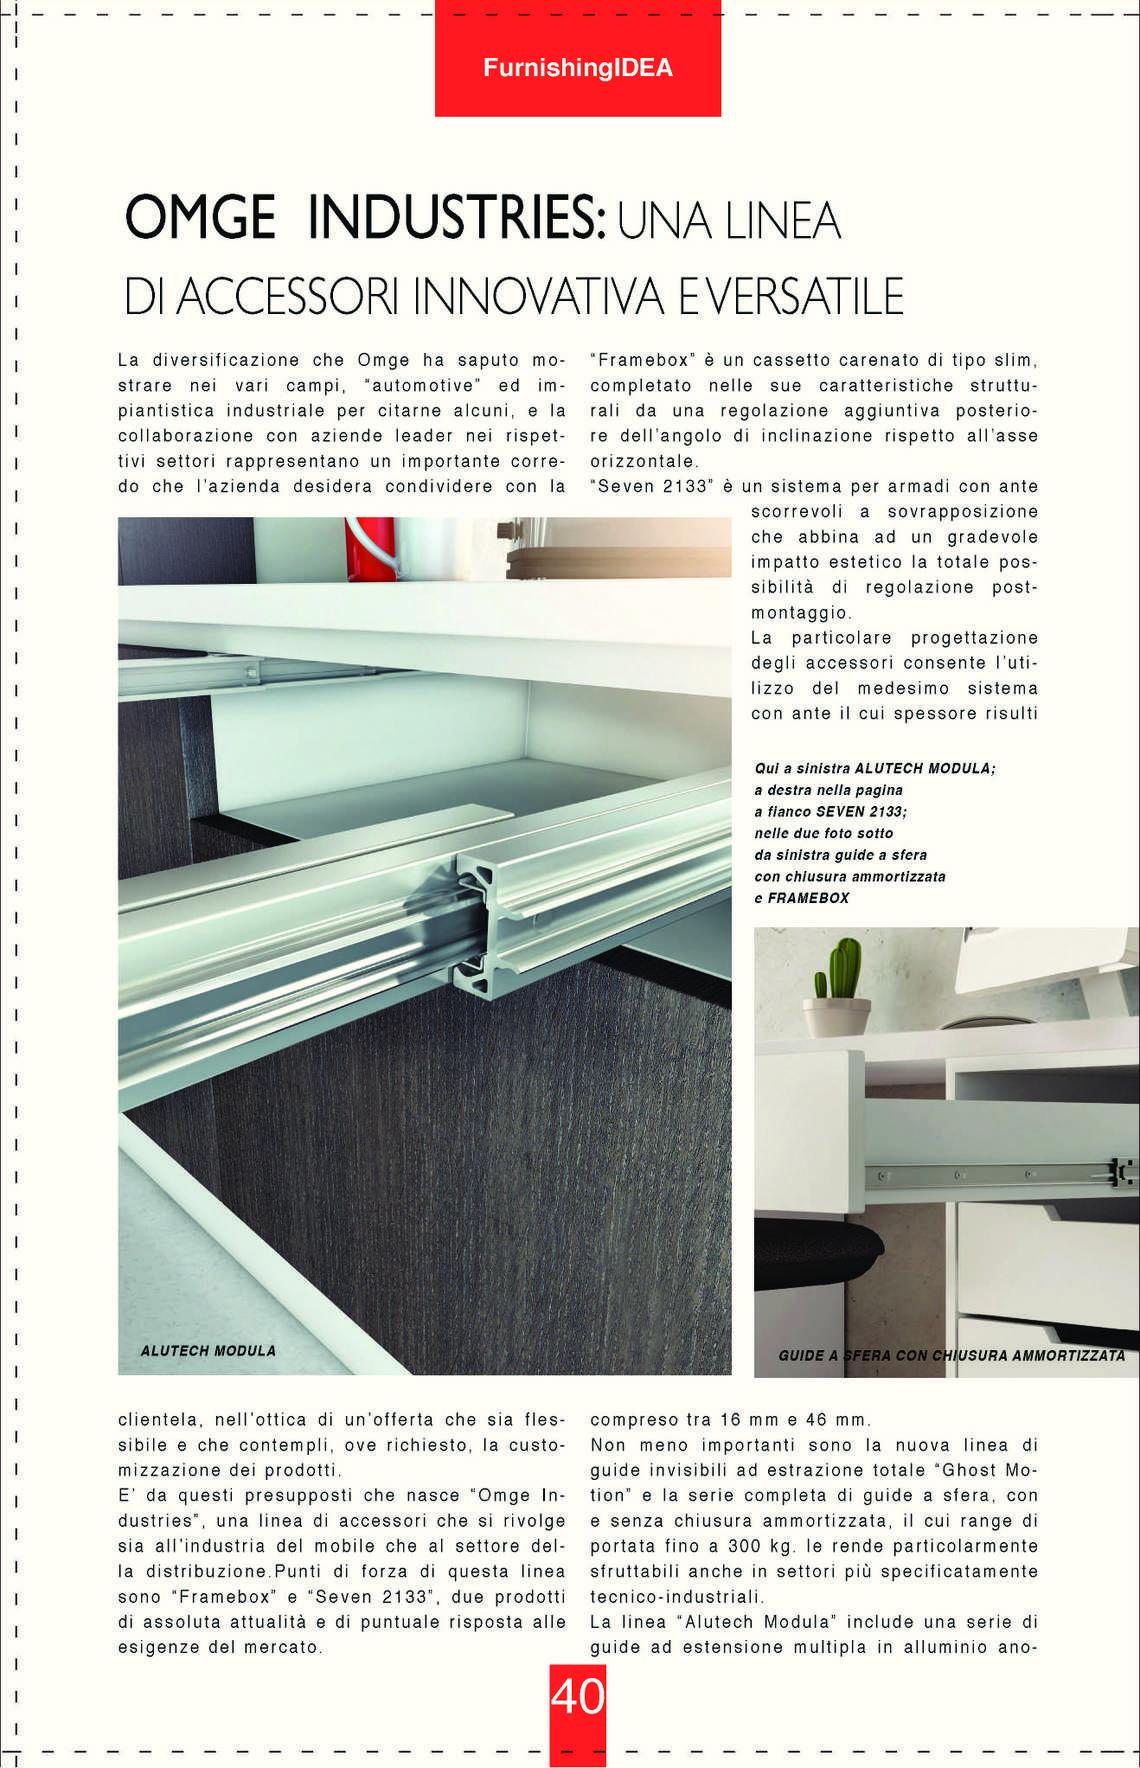 furnishing-idea-journal--1-2018_journal_9_039.jpg